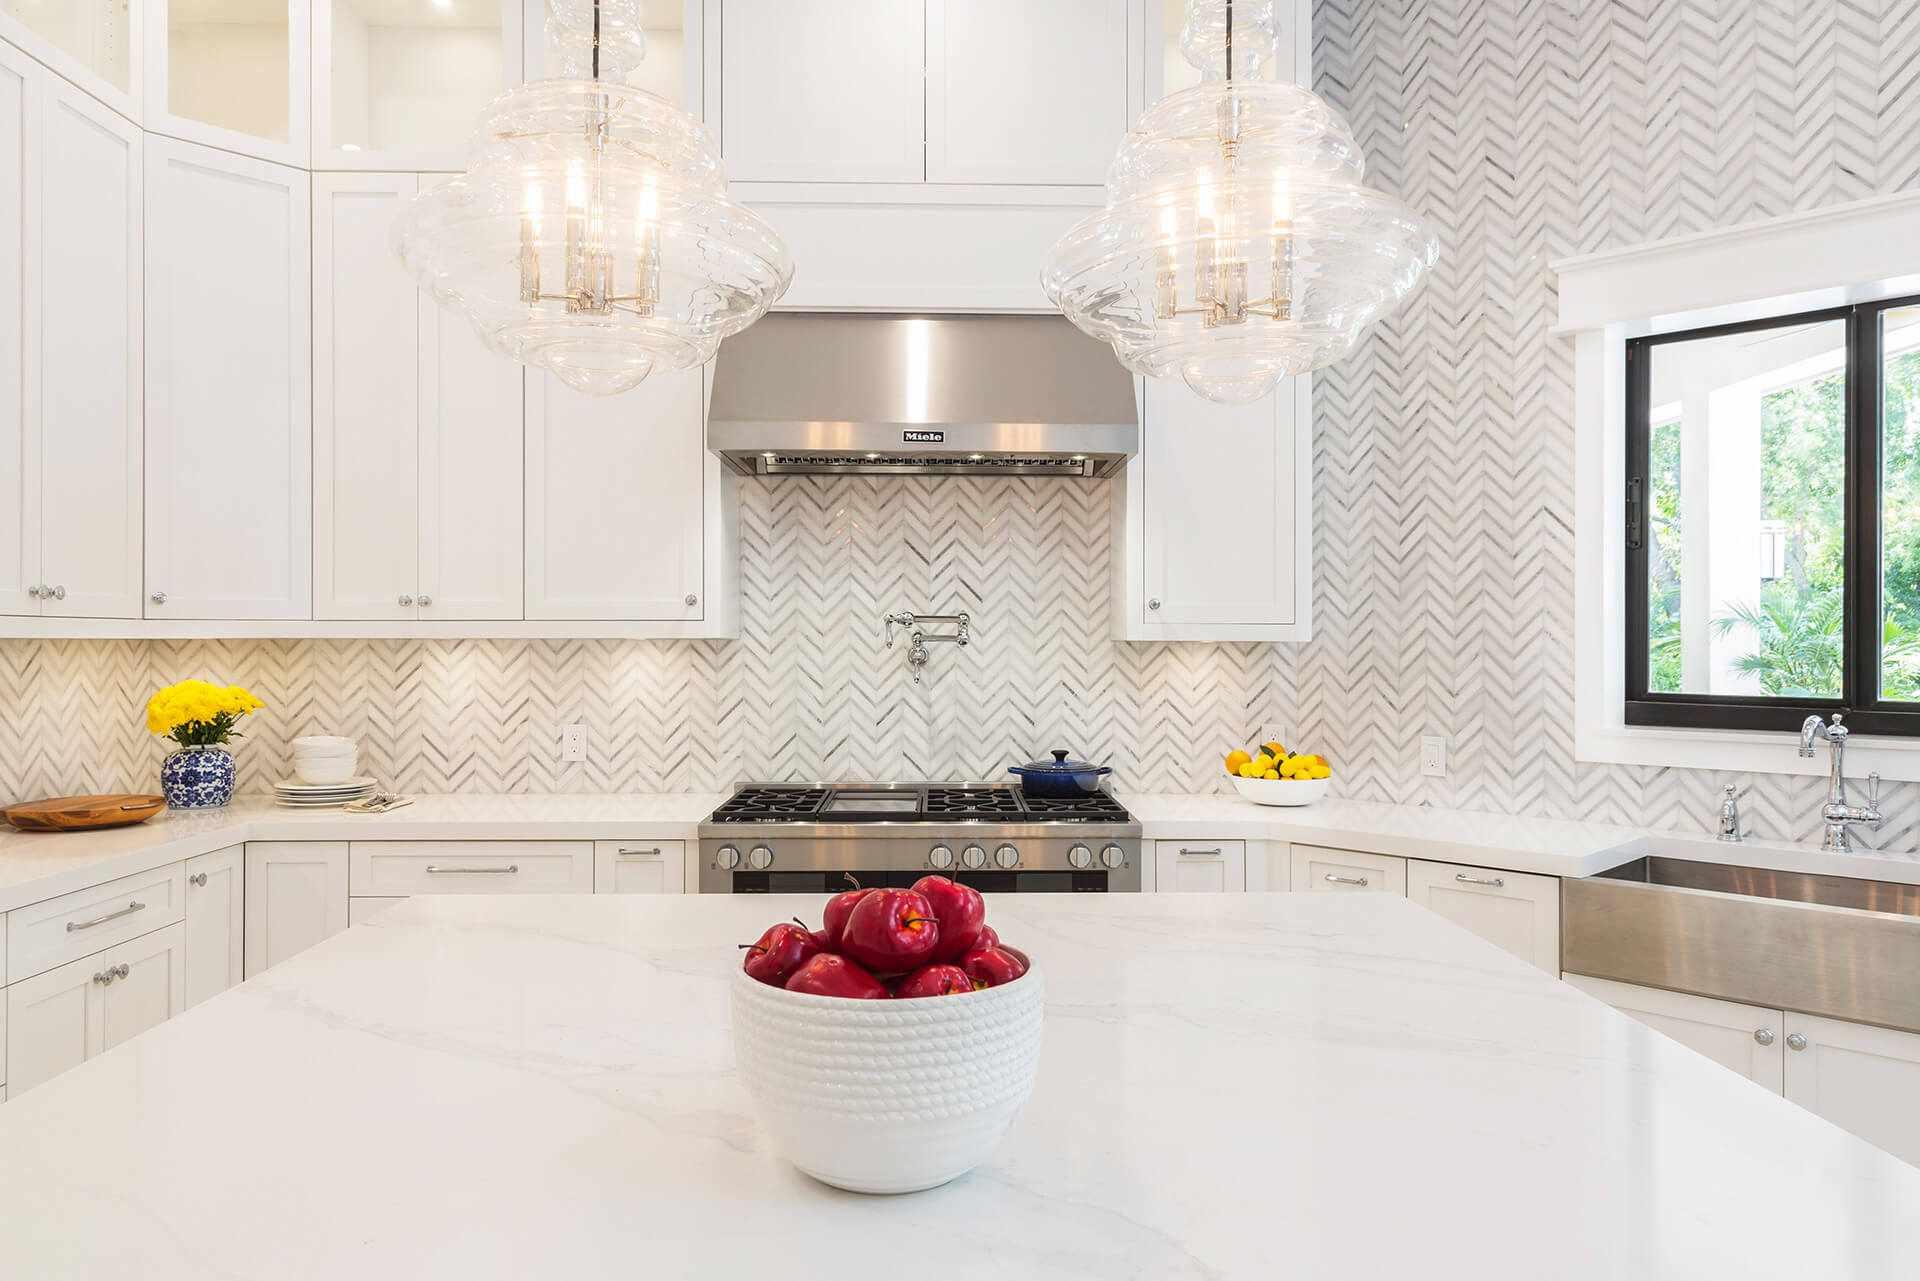 9 Backsplash Ideas Perfect For White Kitchens